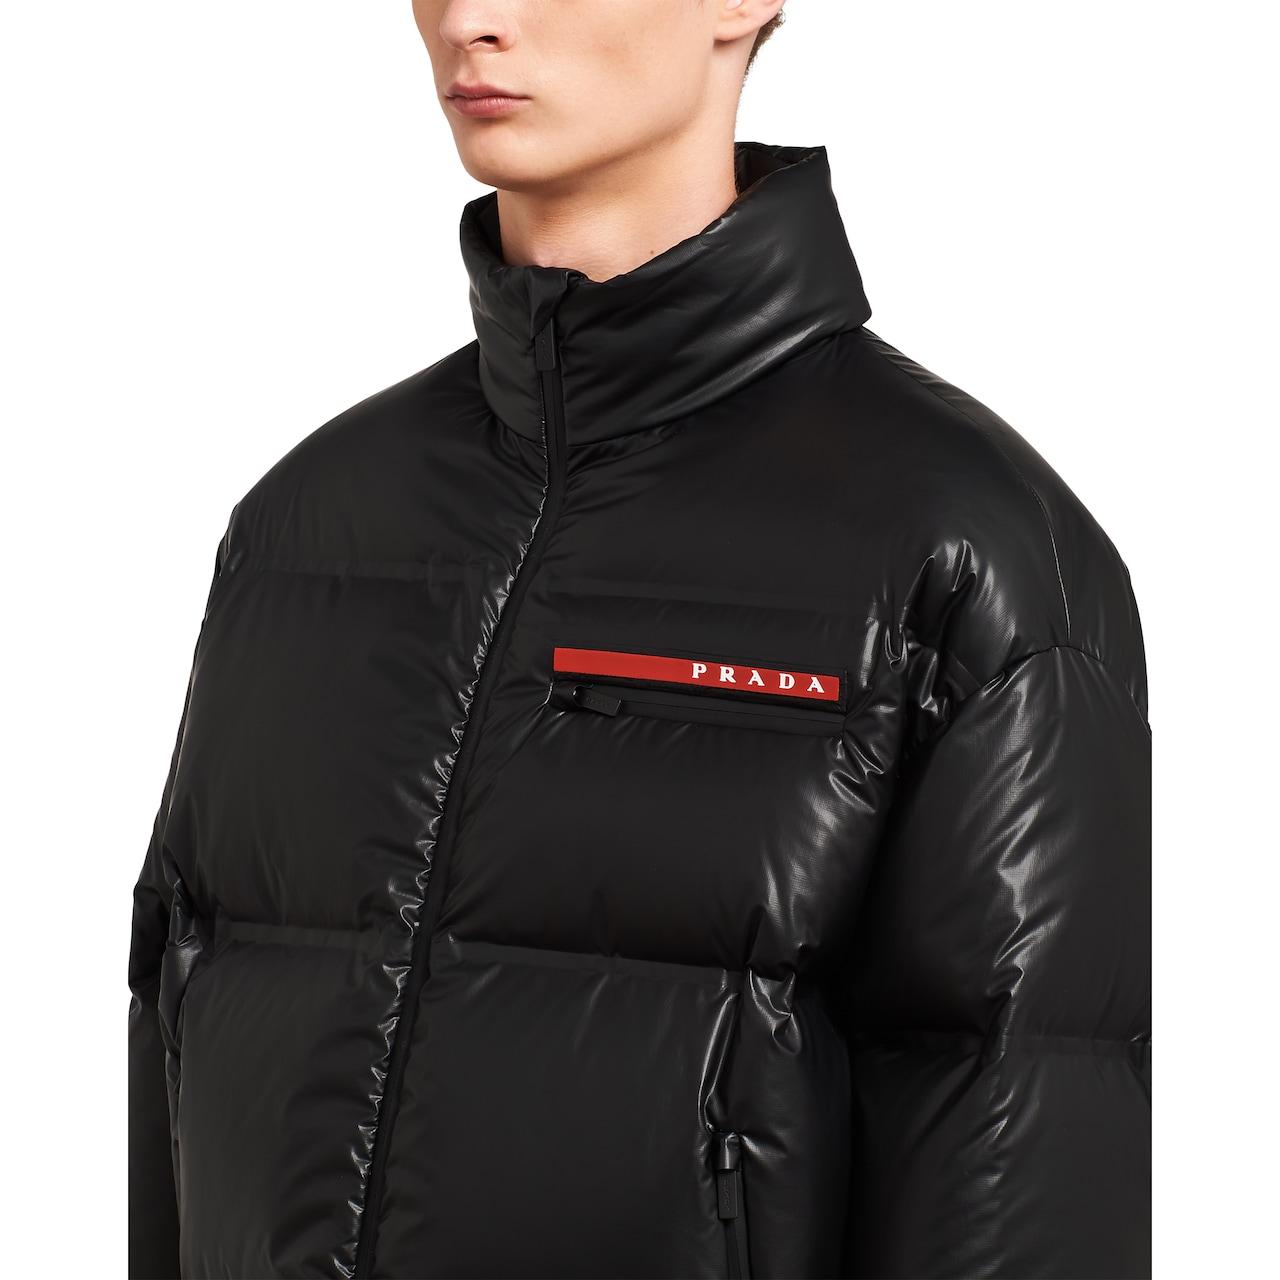 Prada LR-HX015 nylon puffer jacket 5